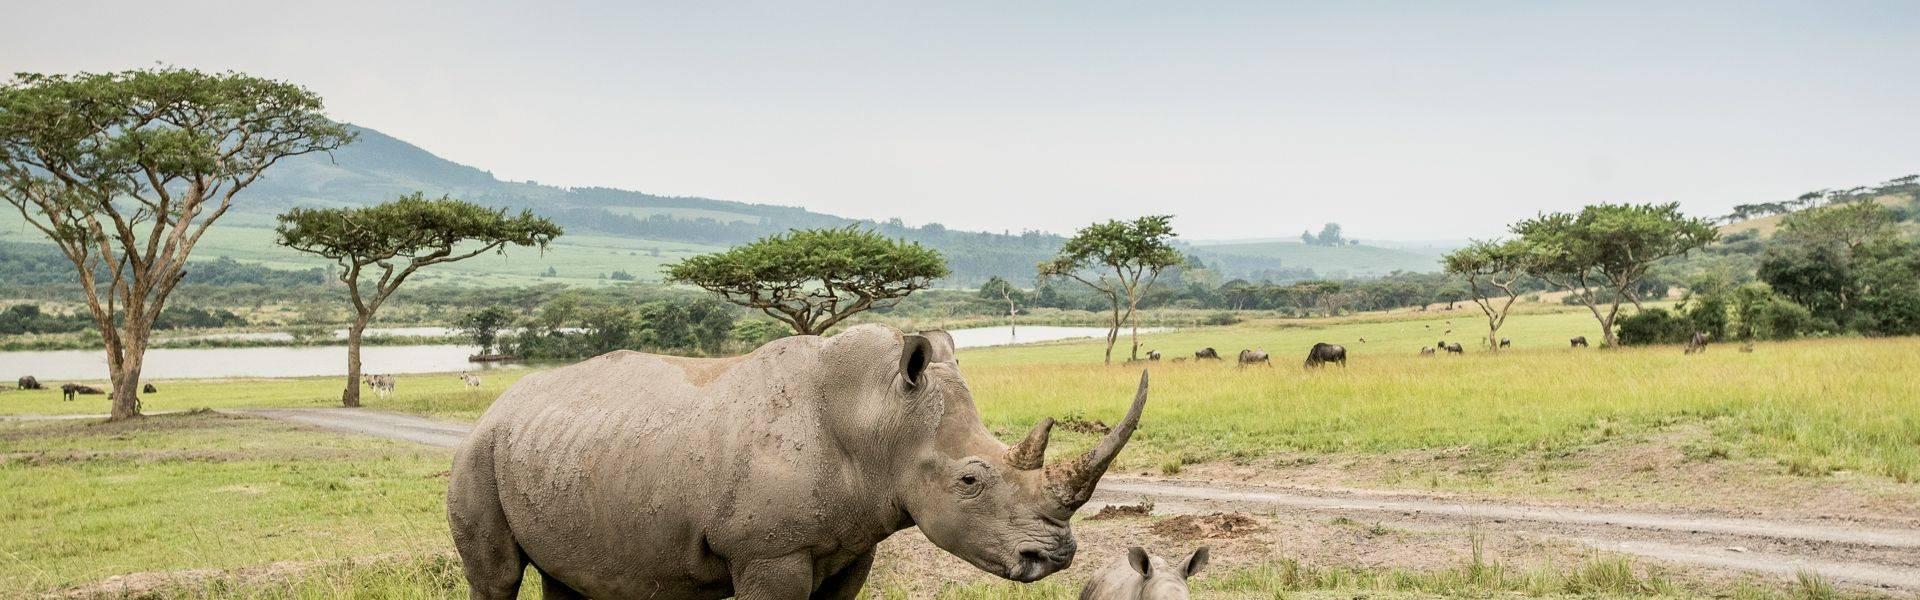 Karkloof-Safari-safari-rhino-1.jpg